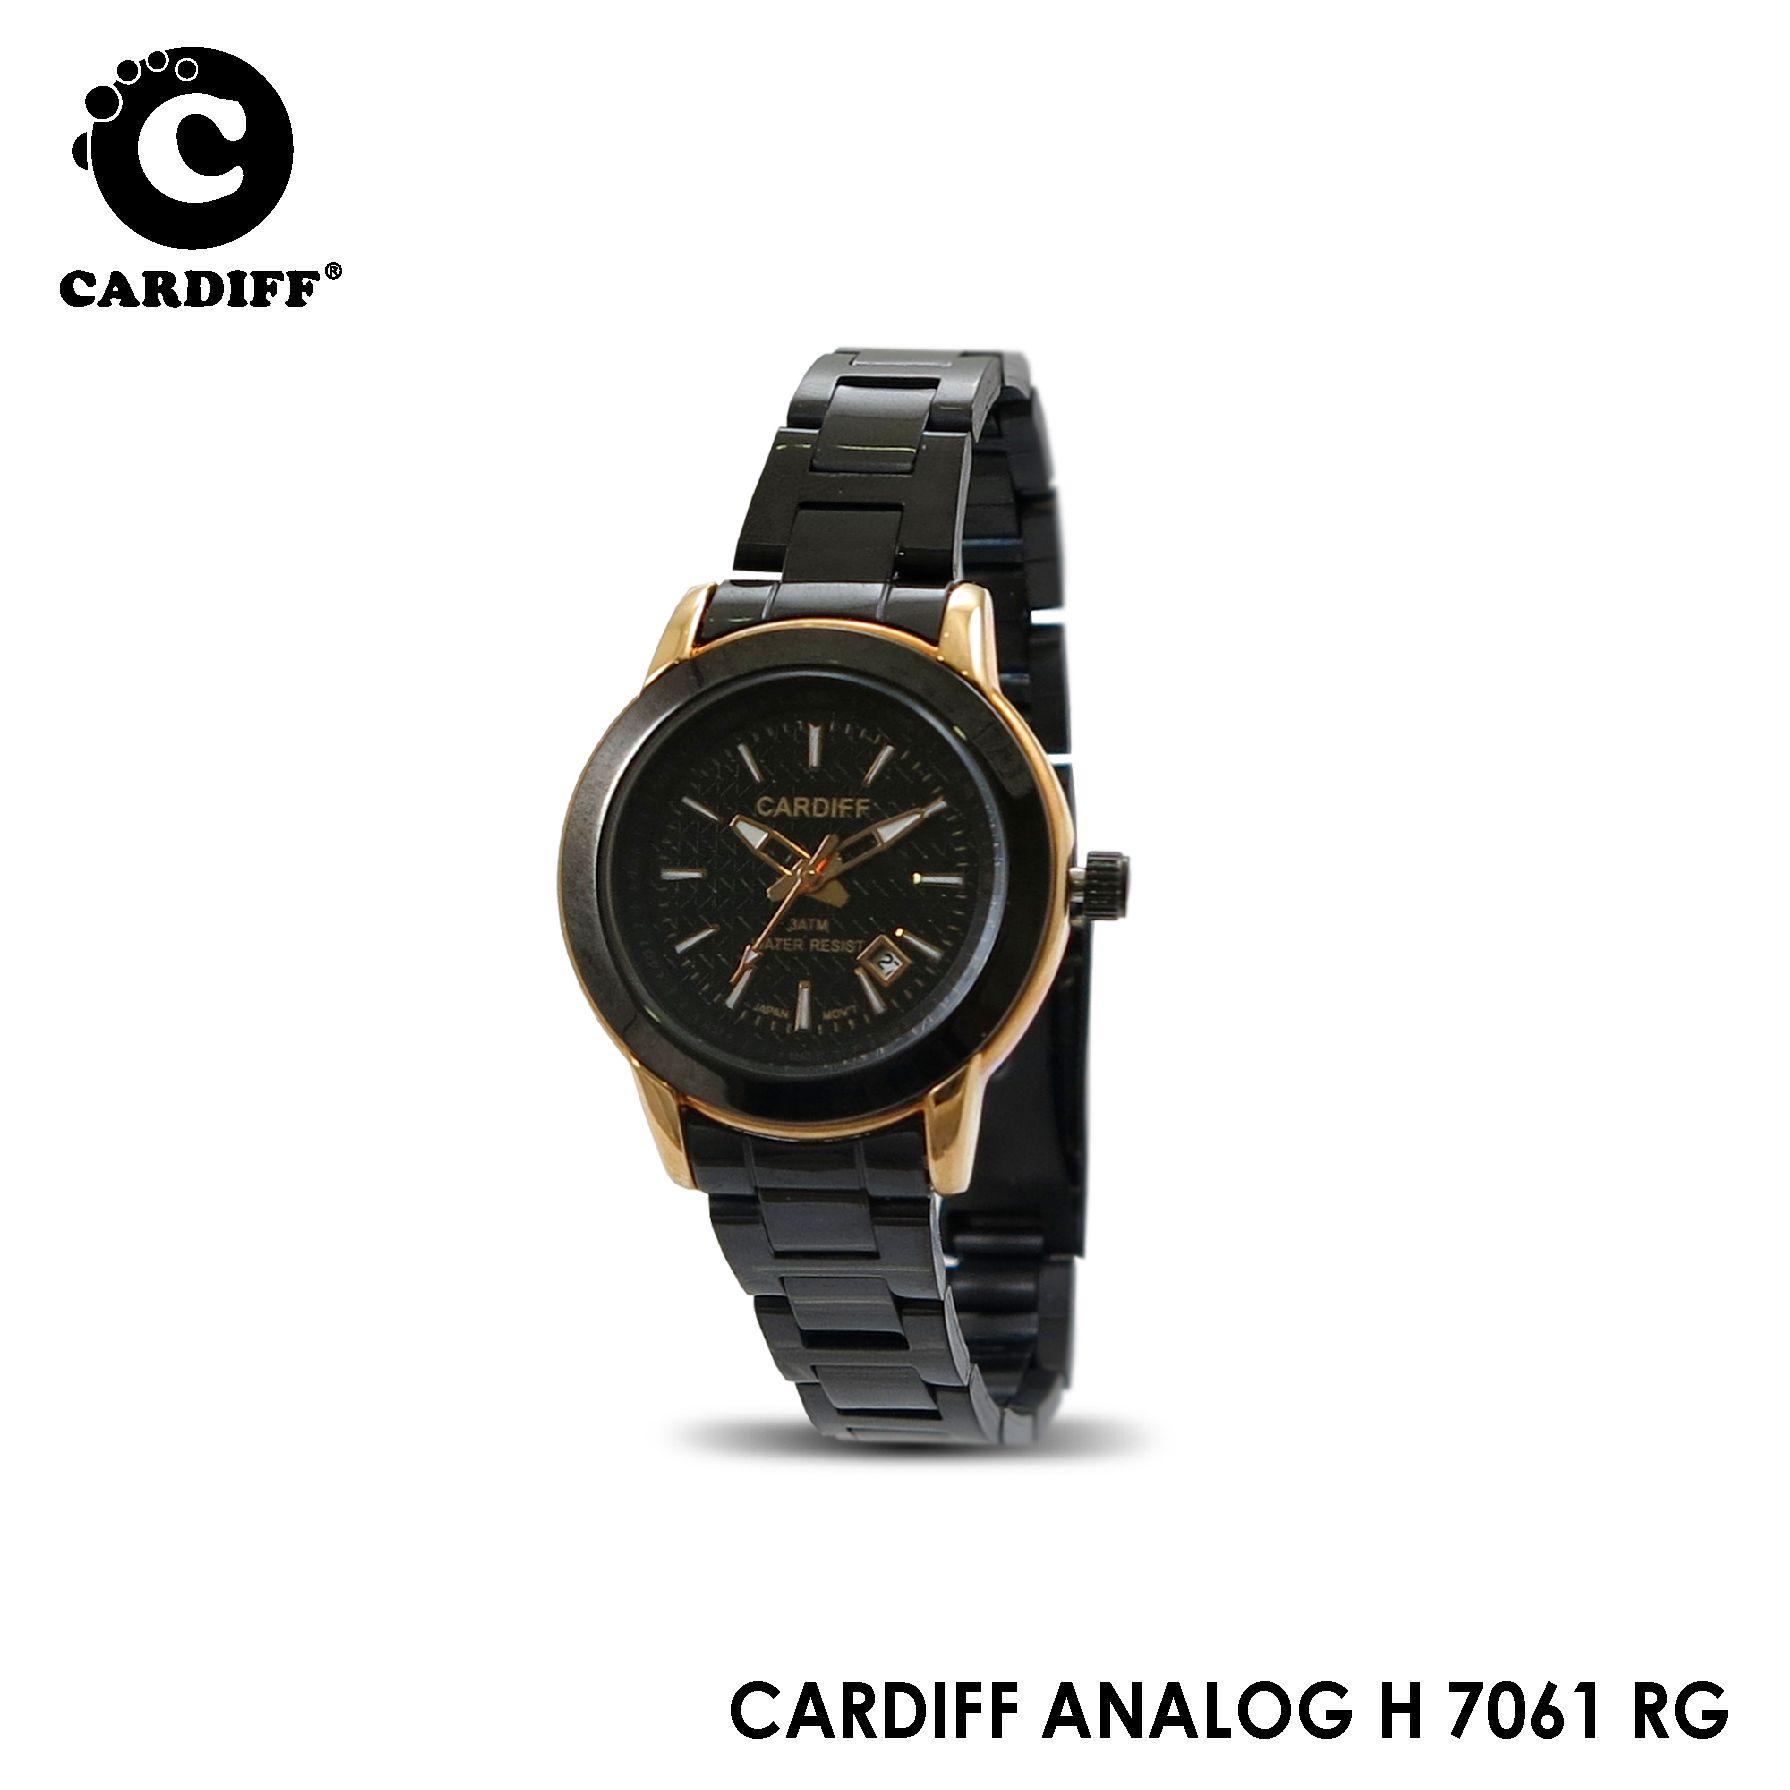 Cardiff Analog H 7061